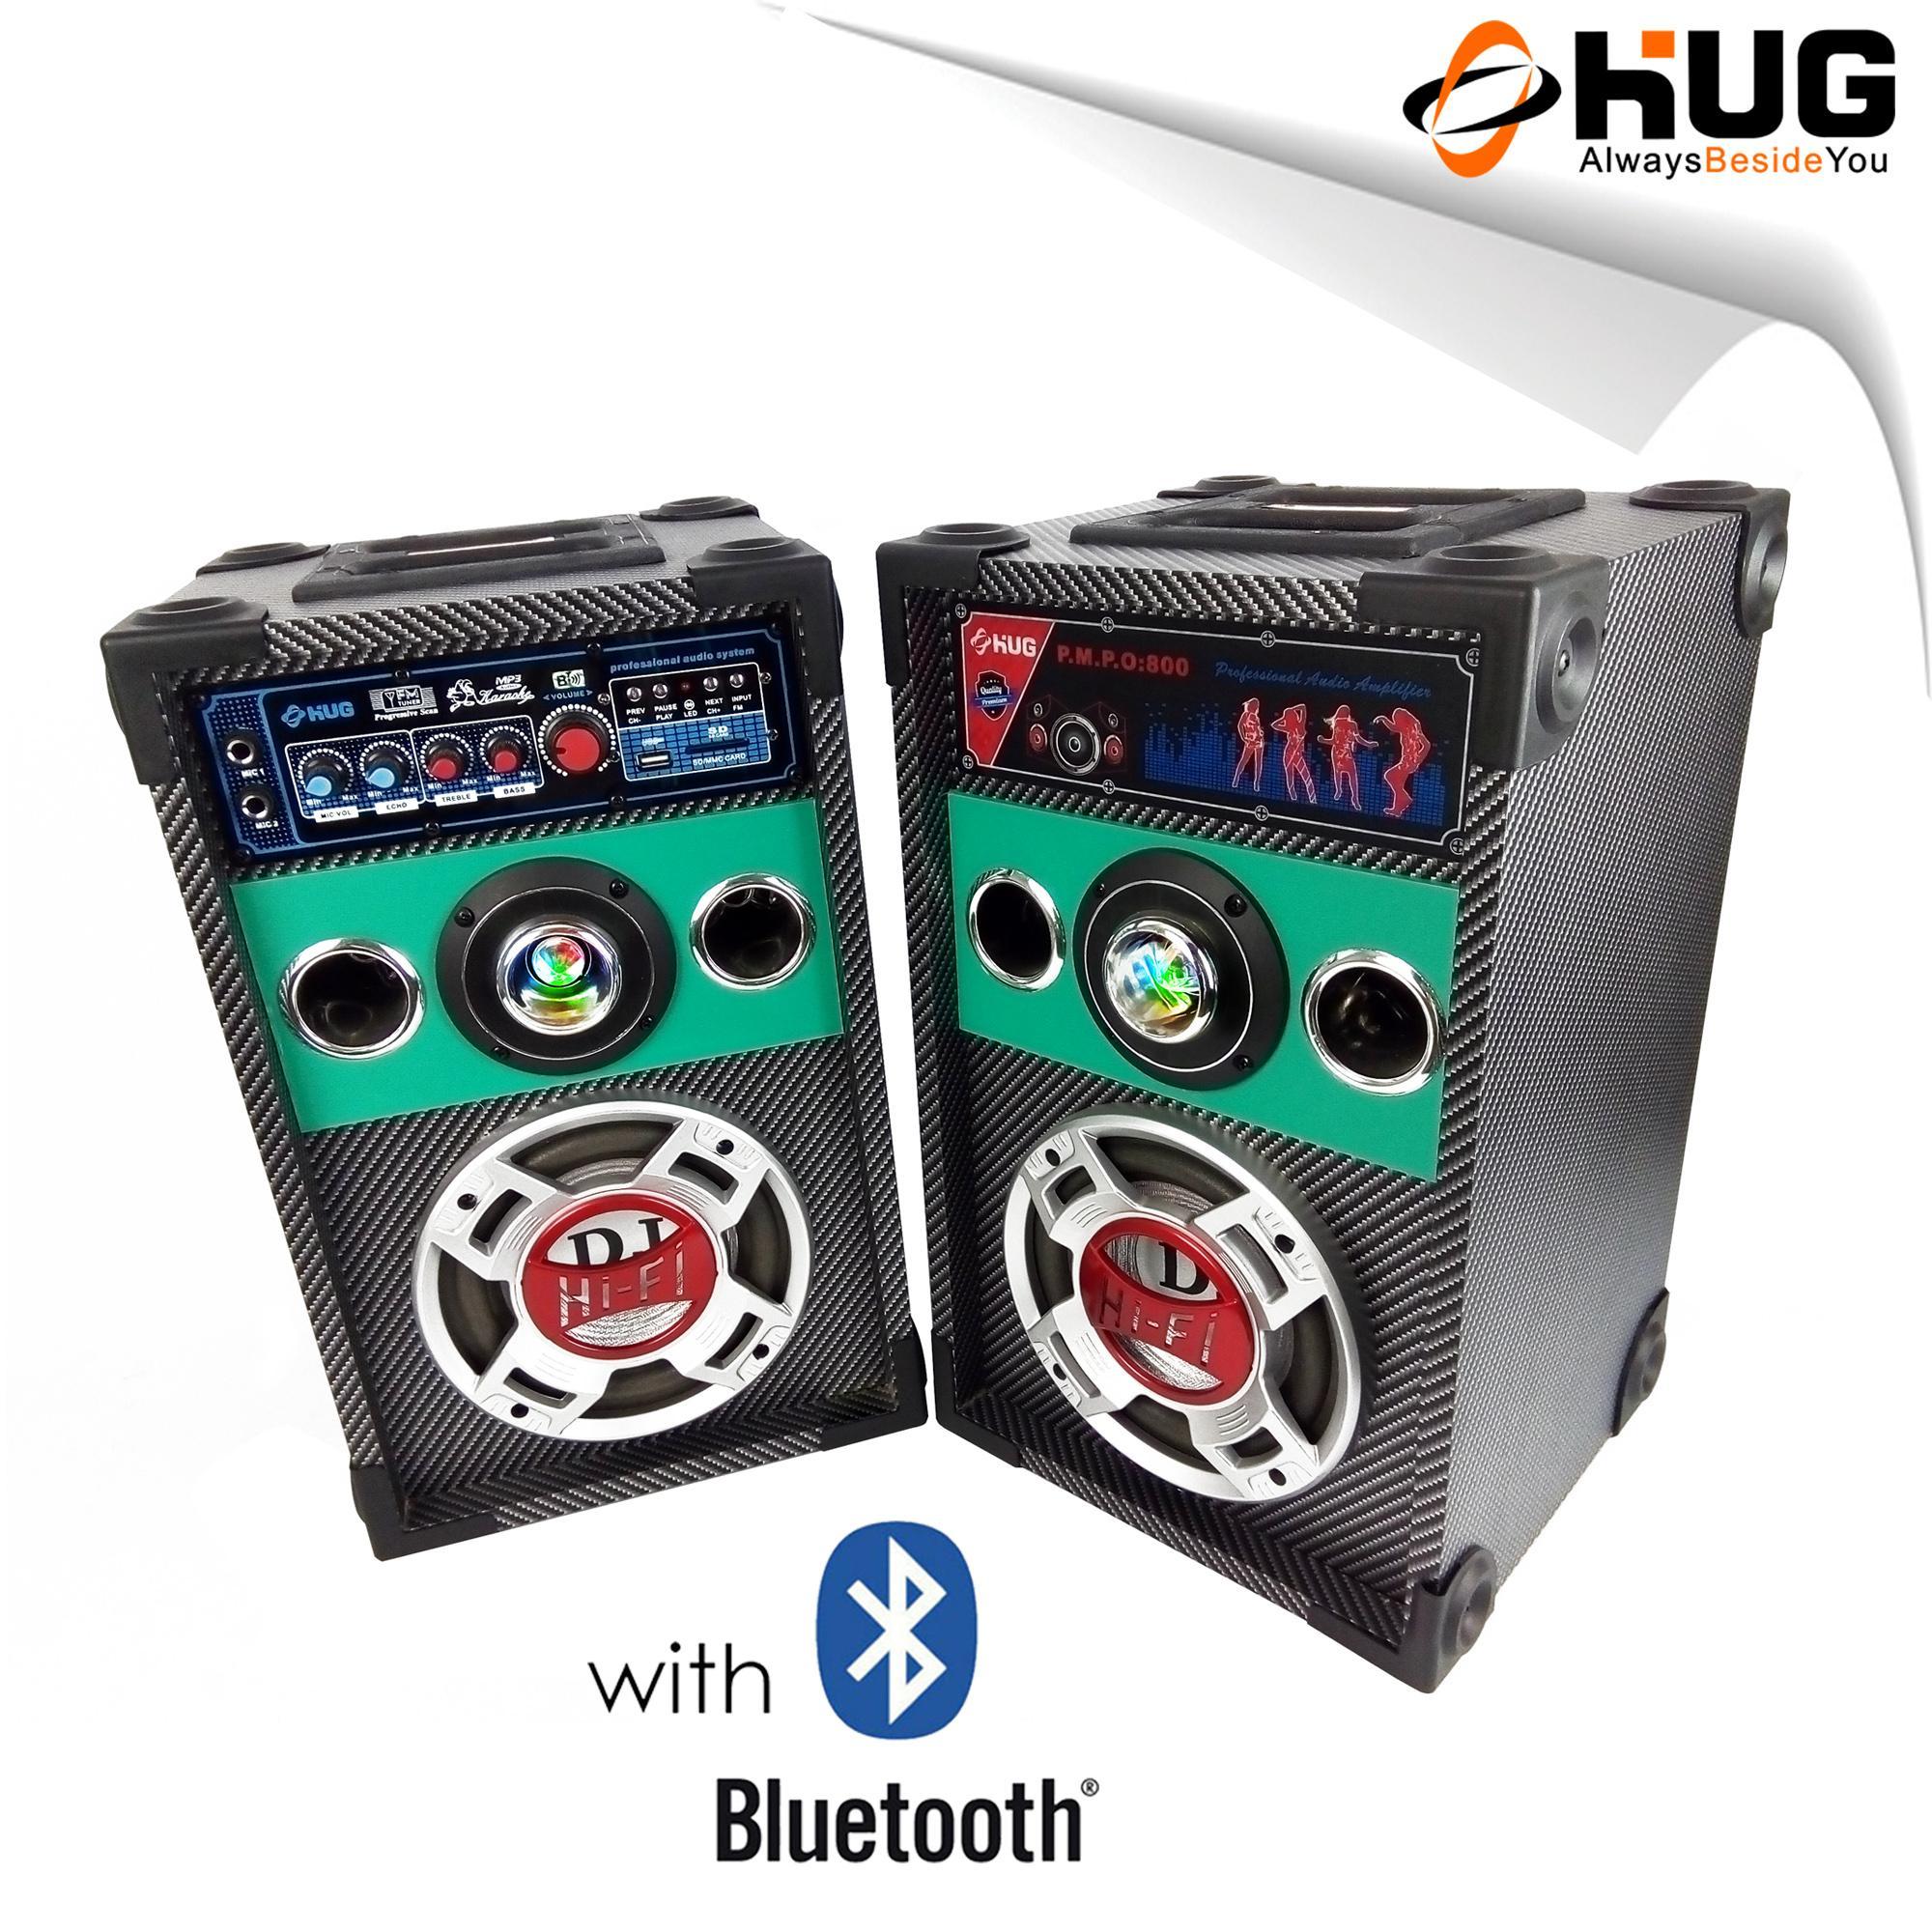 ... HUG Speaker with Built In Amplifier Mic Ports for Karaoke Bluetooth FM